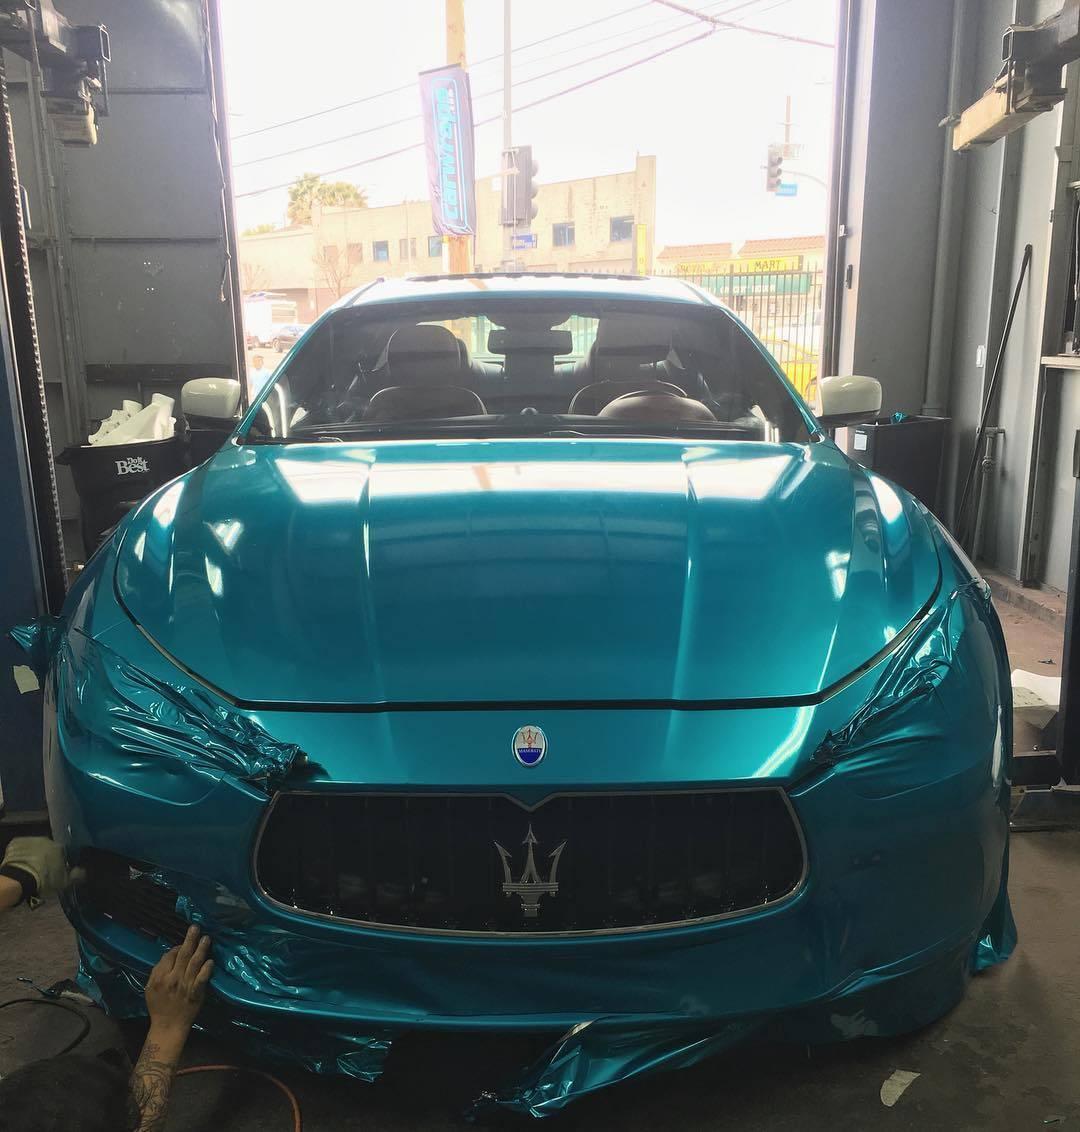 This Maserati (work in progress) looking Sick, and ready for summer vibes… 3MGlossAtomicTeal. #doyou #carwrap #vehiclewrap #carporn #socal #customwrap #maserati #losangeles #paintisdead